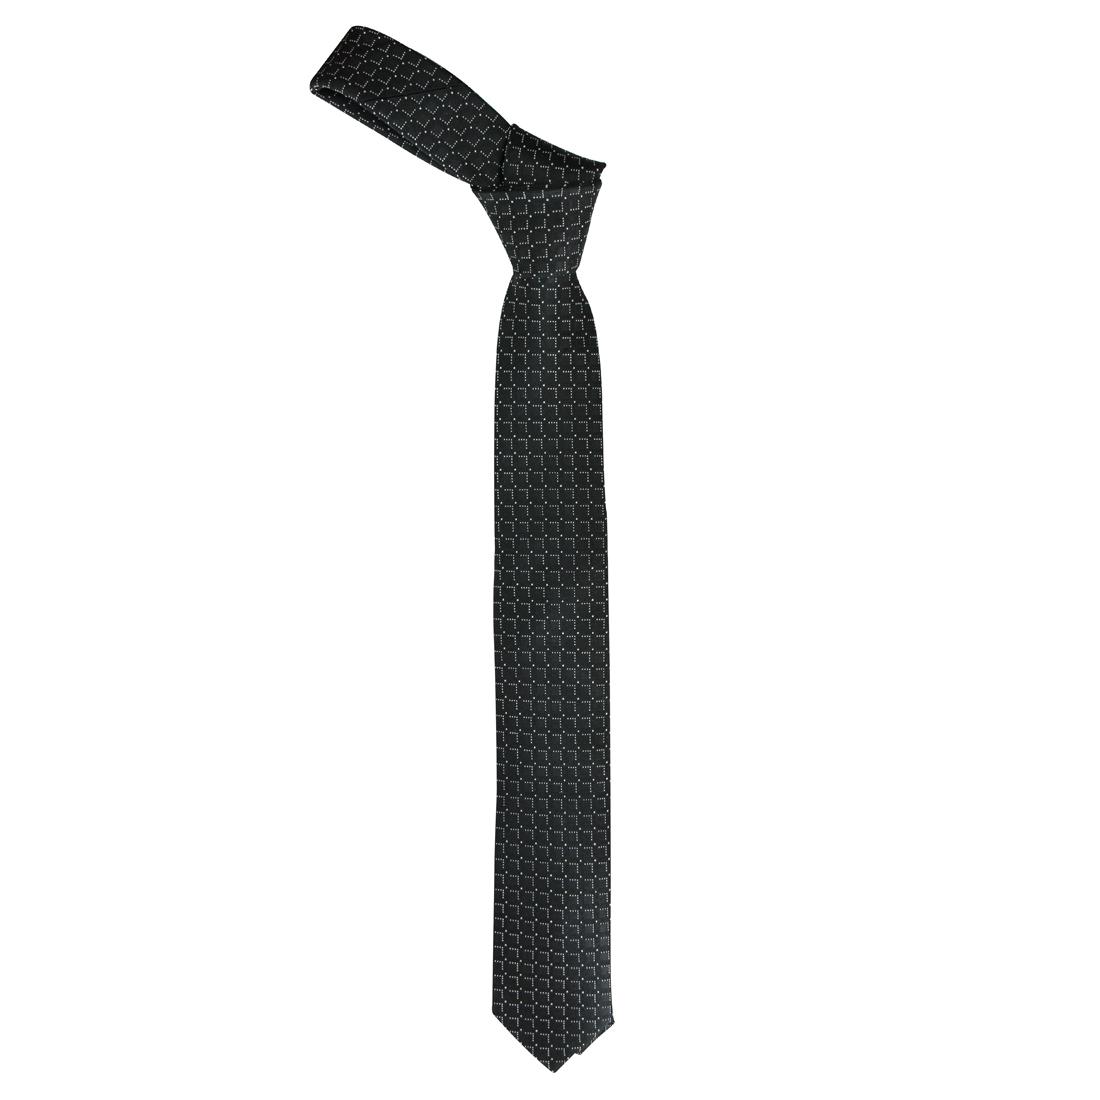 Michaelis accessoire PMNA3G123A in het zwart